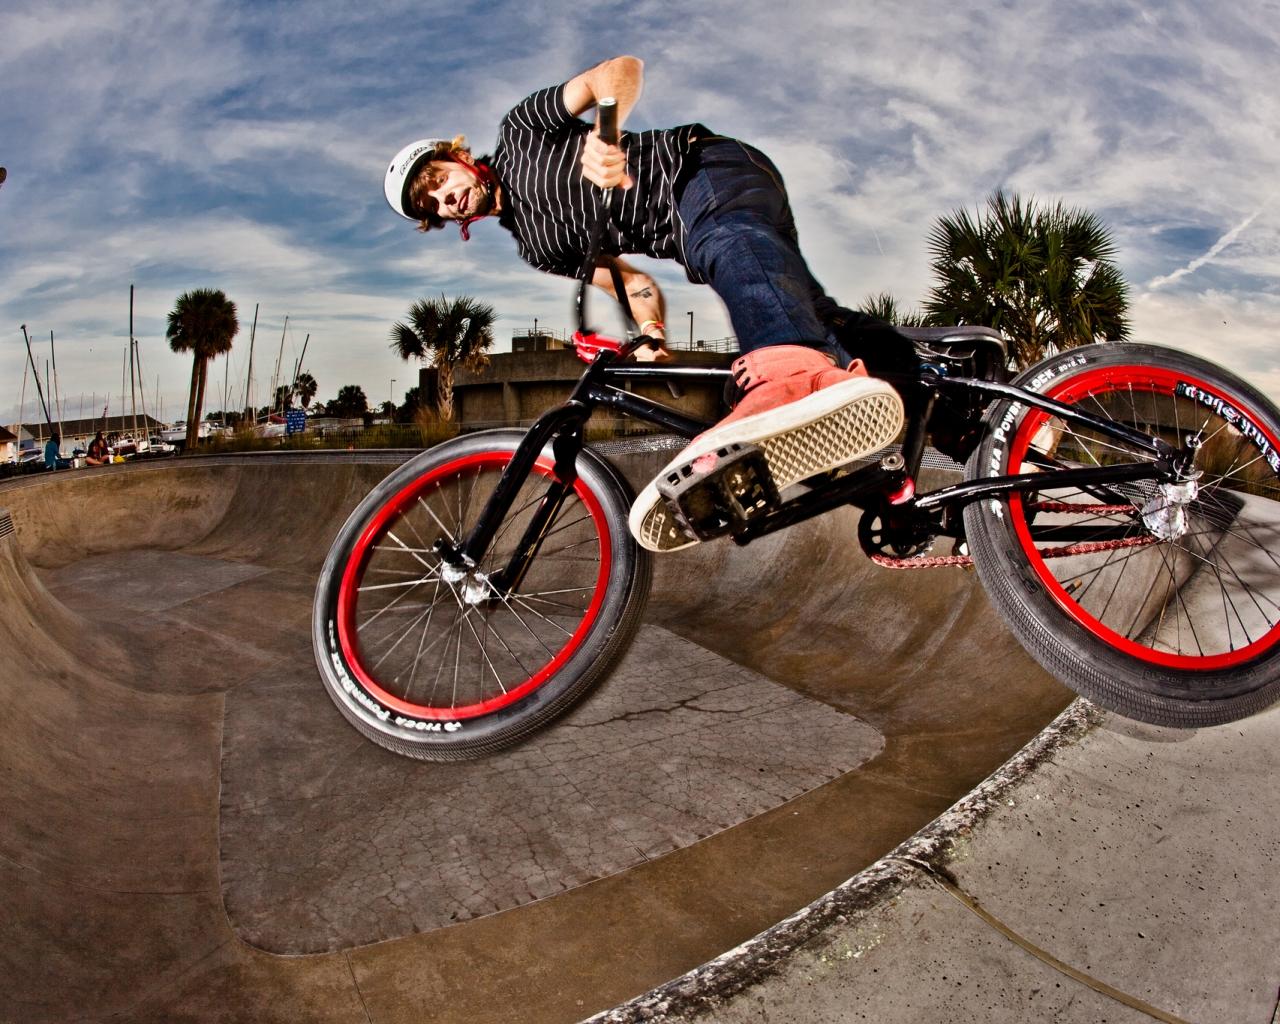 BMX en un Skatepark - 1280x1024